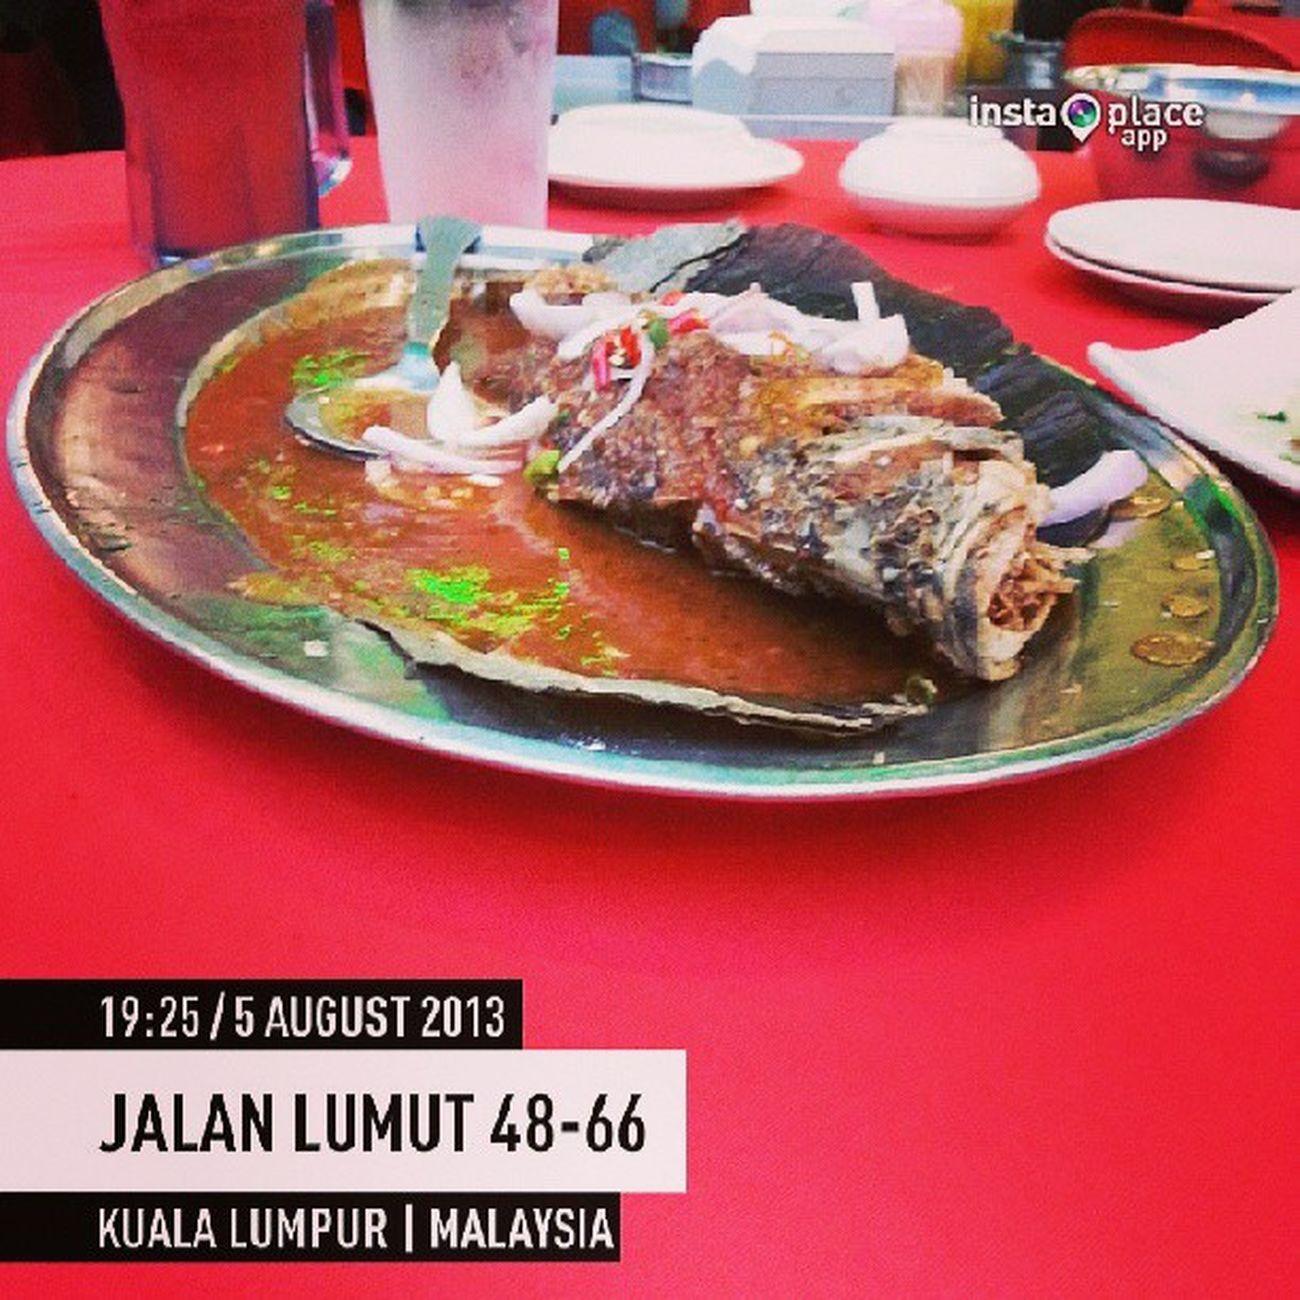 Instaplaceapp @instaplacemobi Androidonly Androidnesia Kuala Lumpur Malaysia